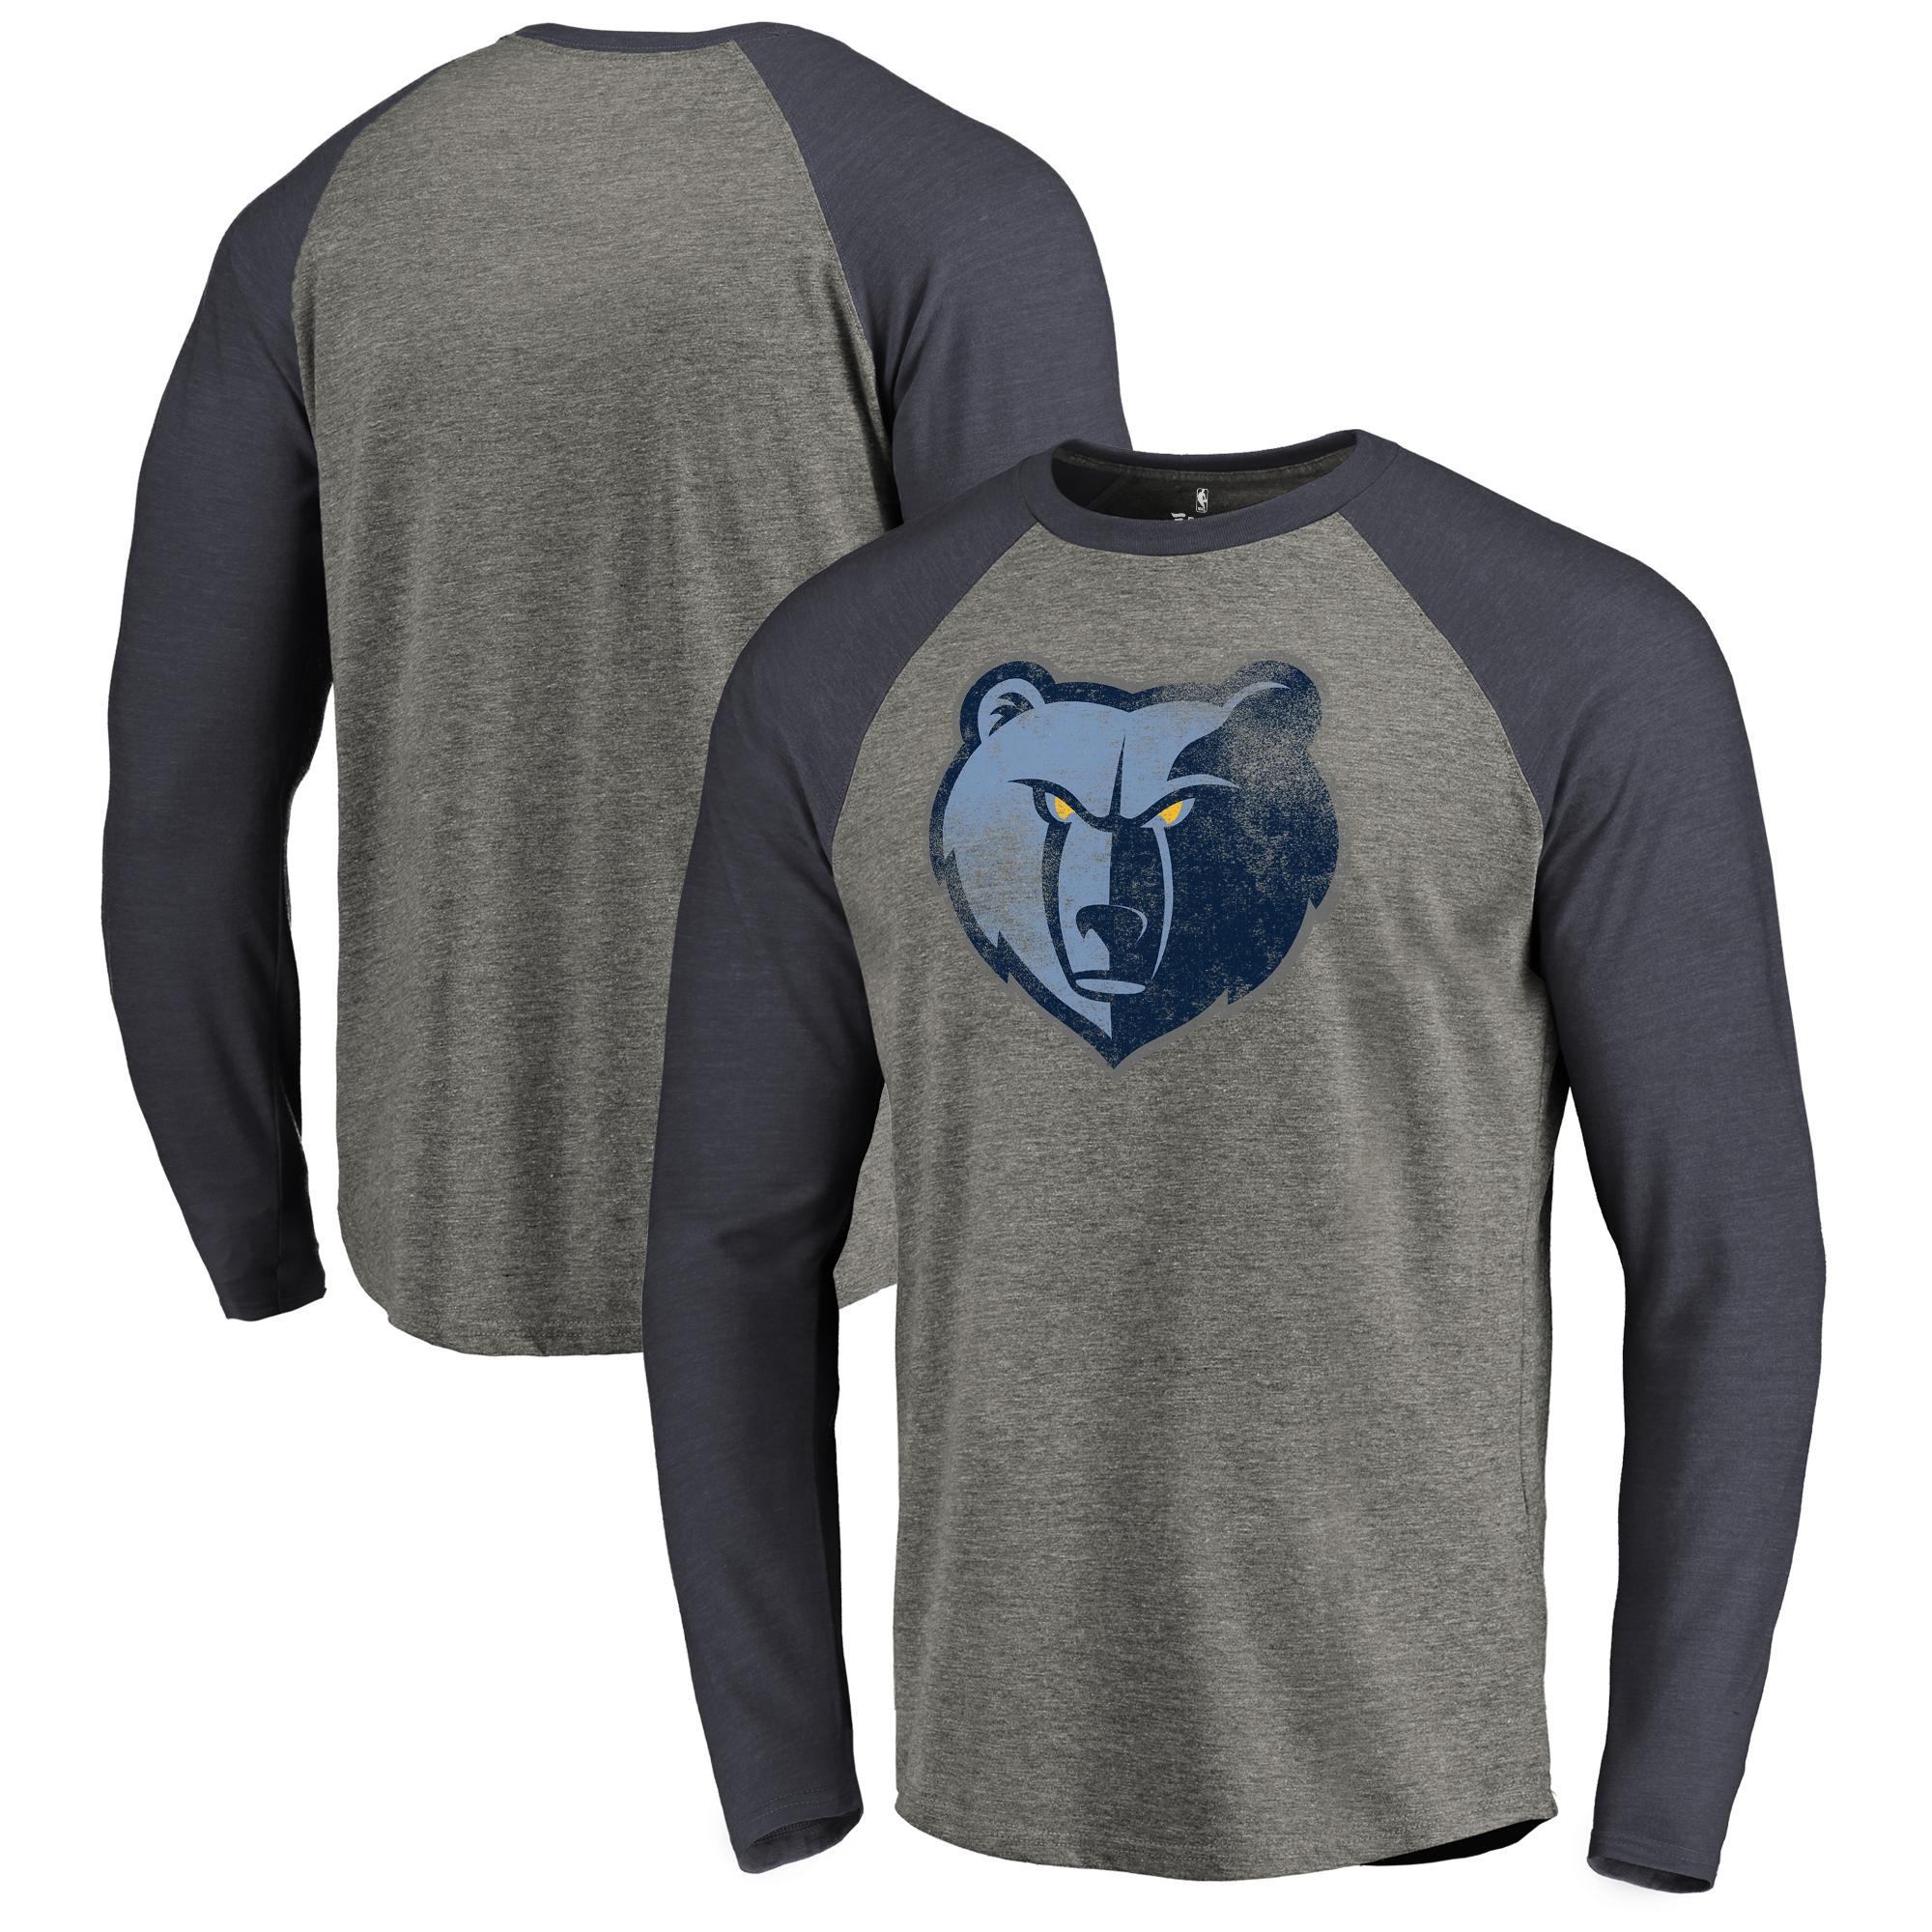 Memphis Grizzlies Fanatics Branded Distressed Logo Tri-Blend Raglan Long Sleeve T-Shirt - Ash/Navy